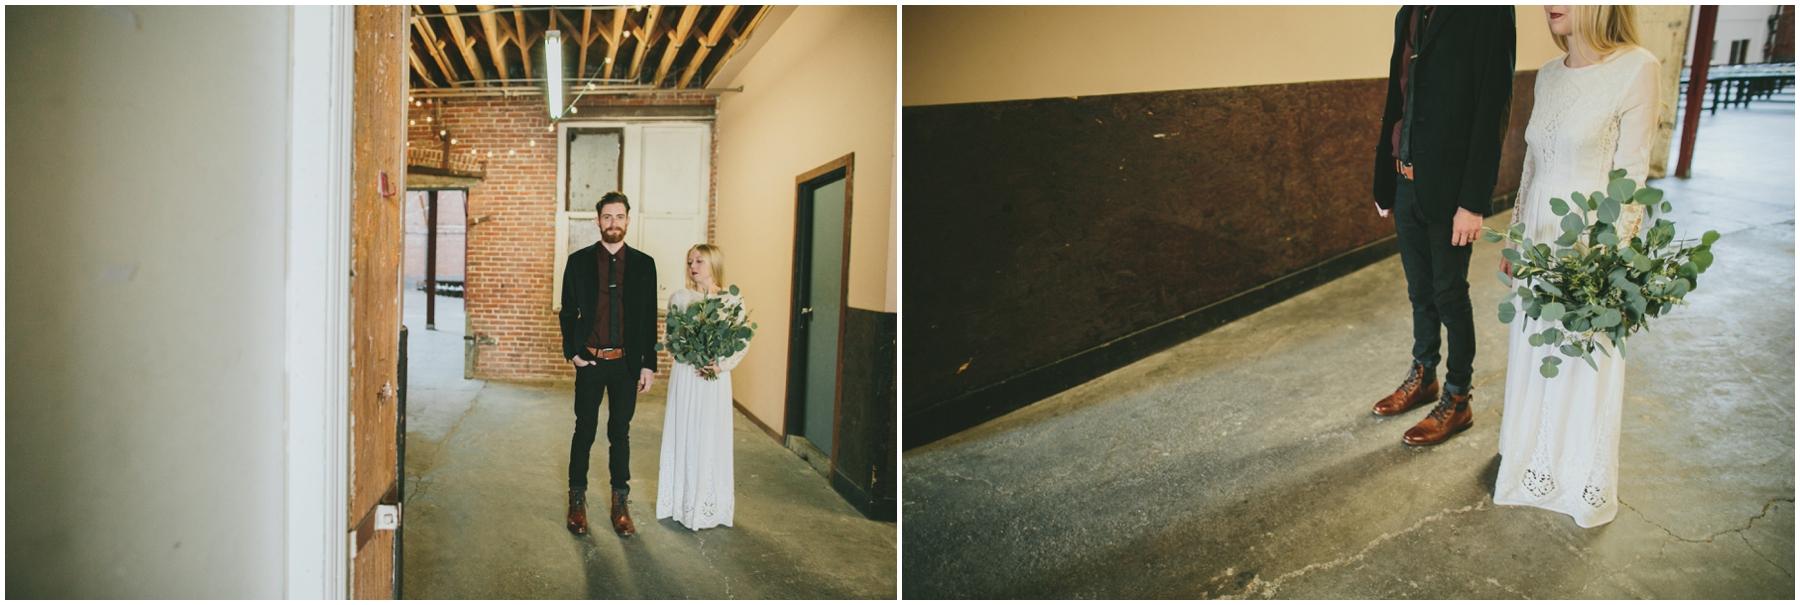 Natalie+Corey-WEDDING_KELLYBOITANO_0034